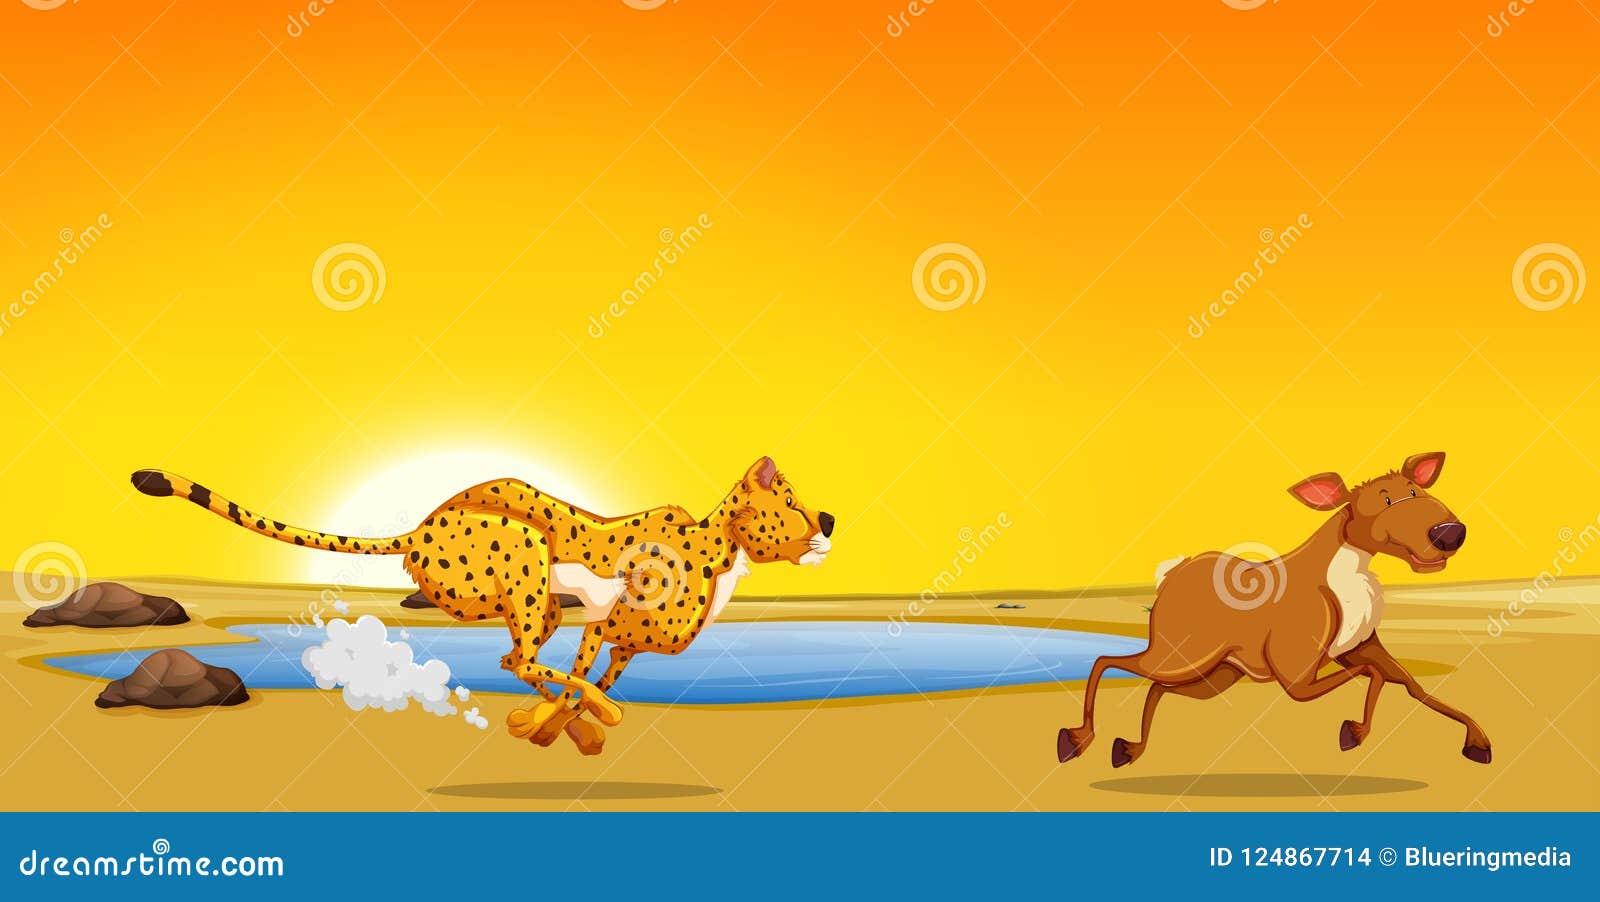 A cheetah hunting deer stock illustration. Illustration of graphic.